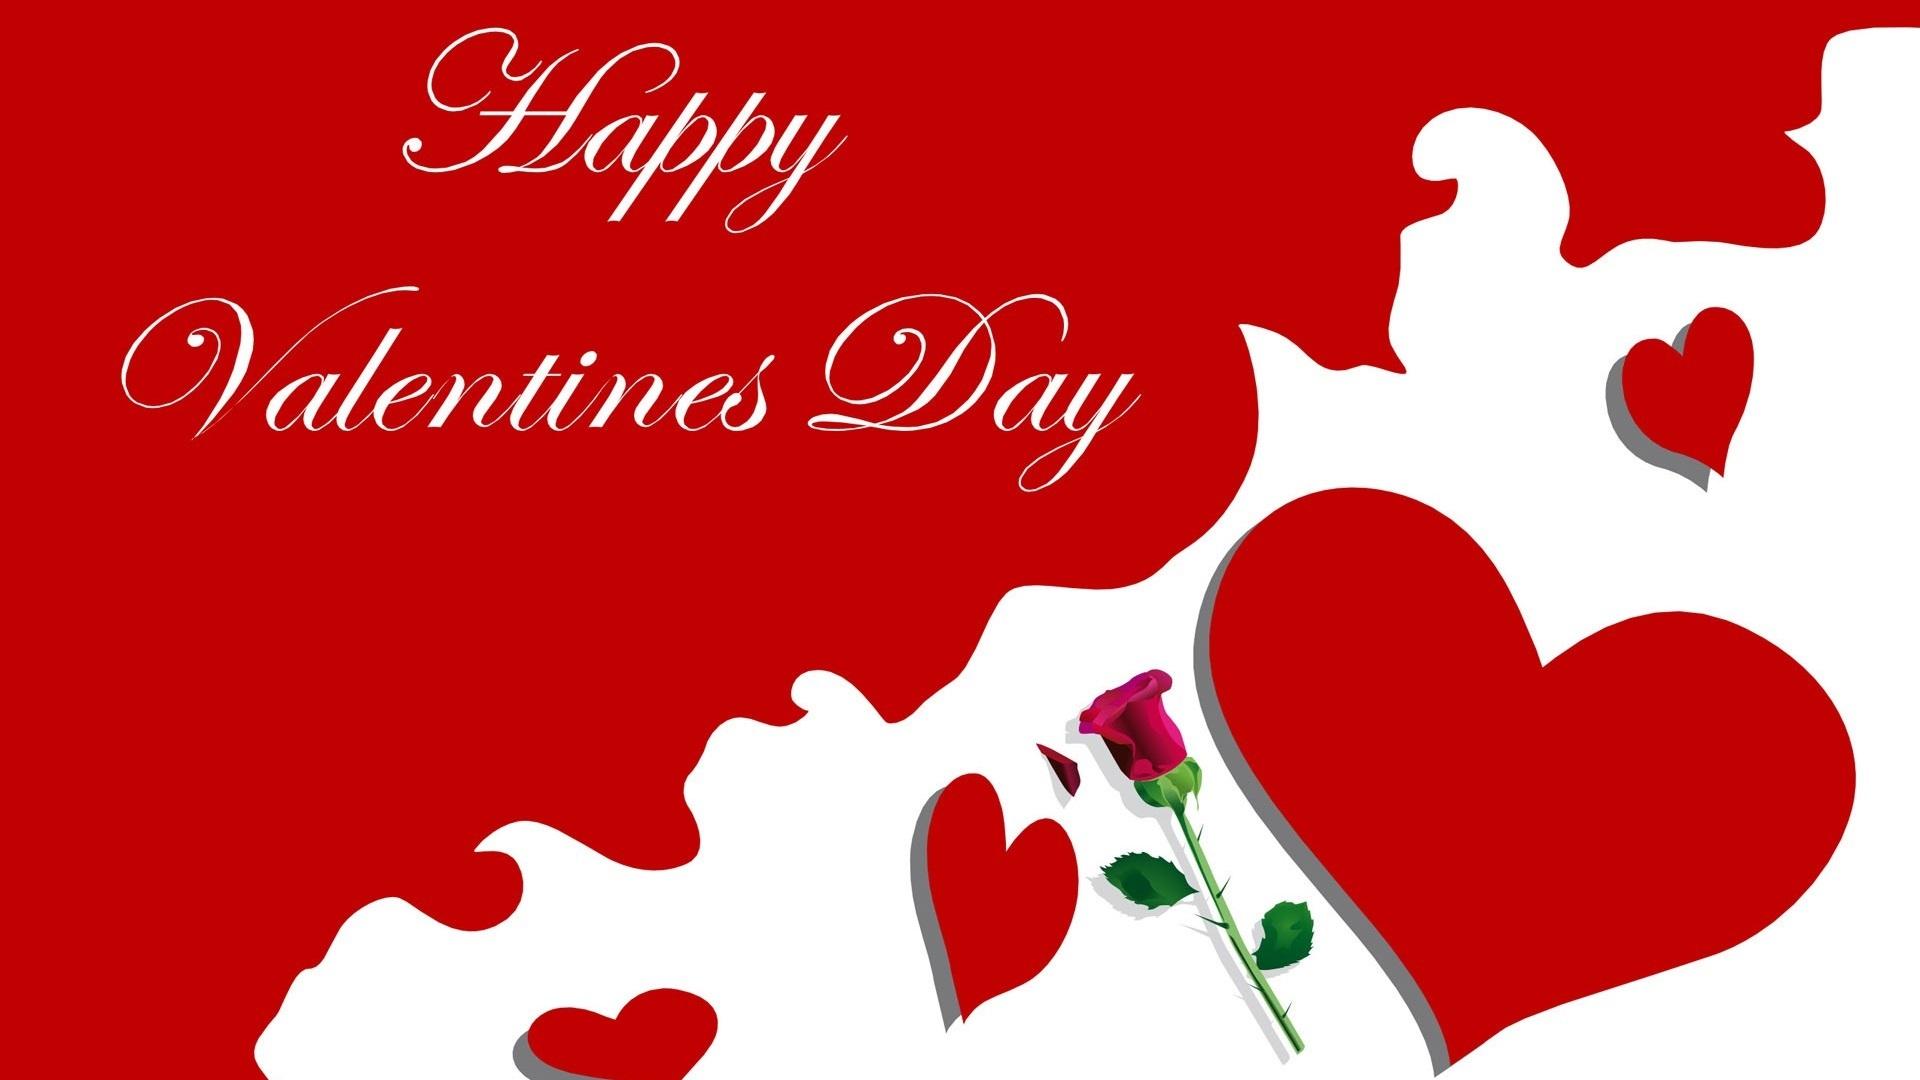 życzenia Walentynkowe: Życzenia Walentynkowe Z Różą I Sercami